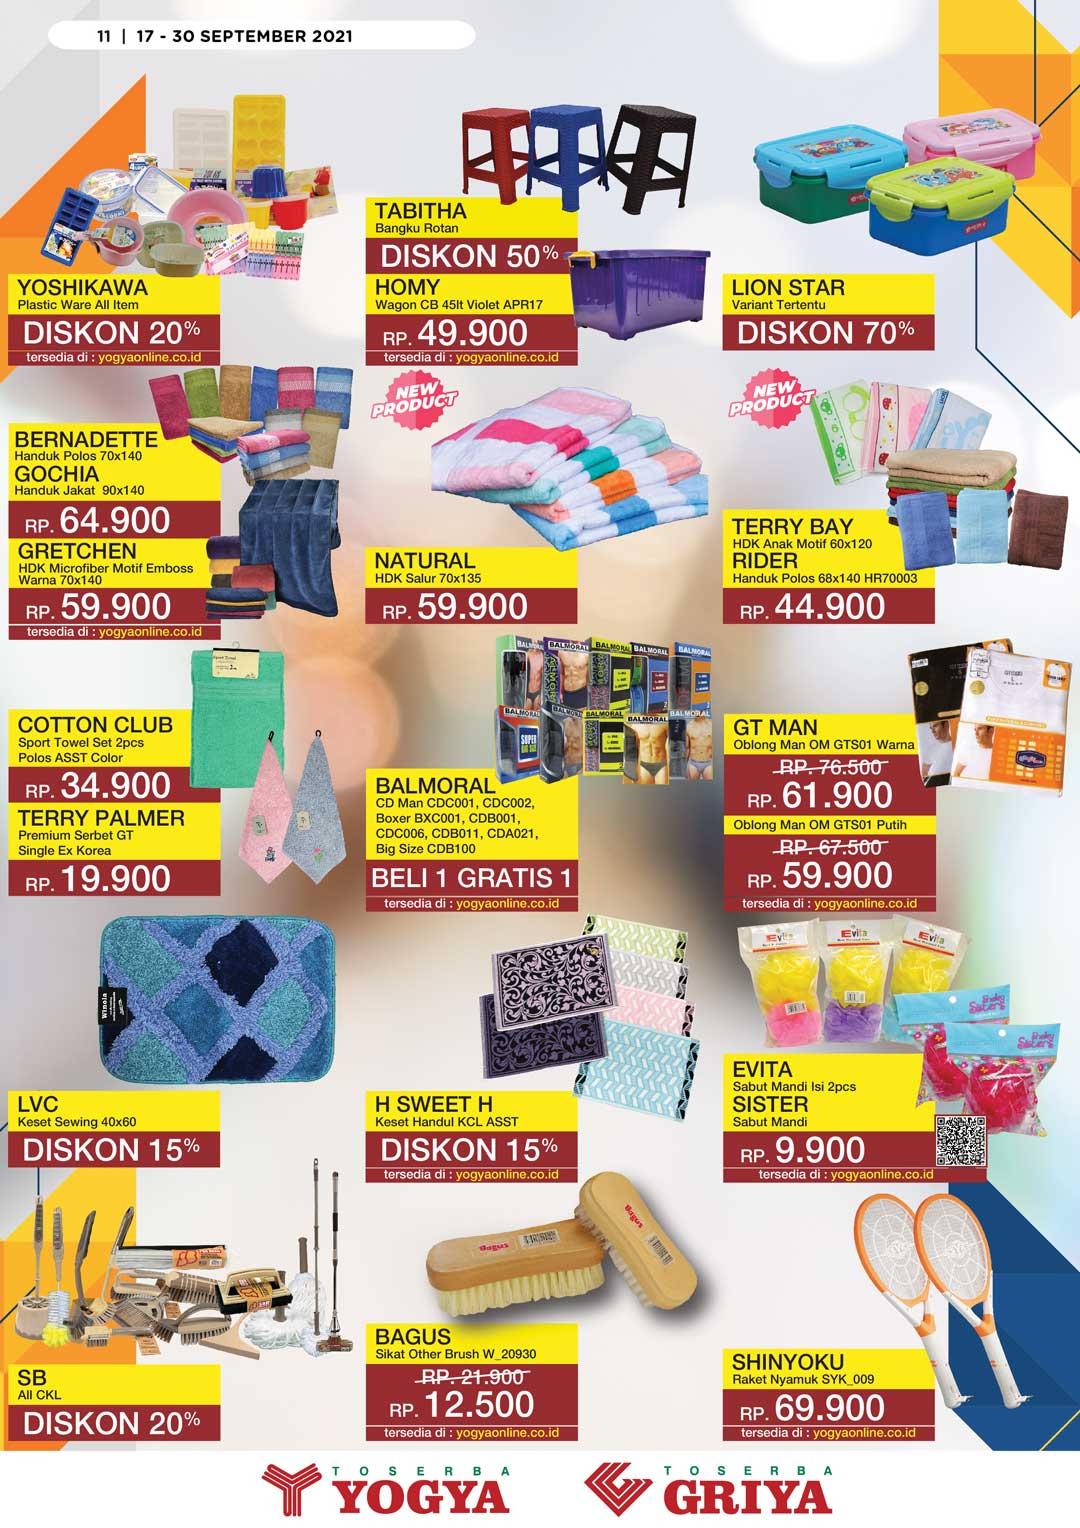 Katalog Toserba Yogya Promo SERBA HEMAT periode 17-30 September 2021